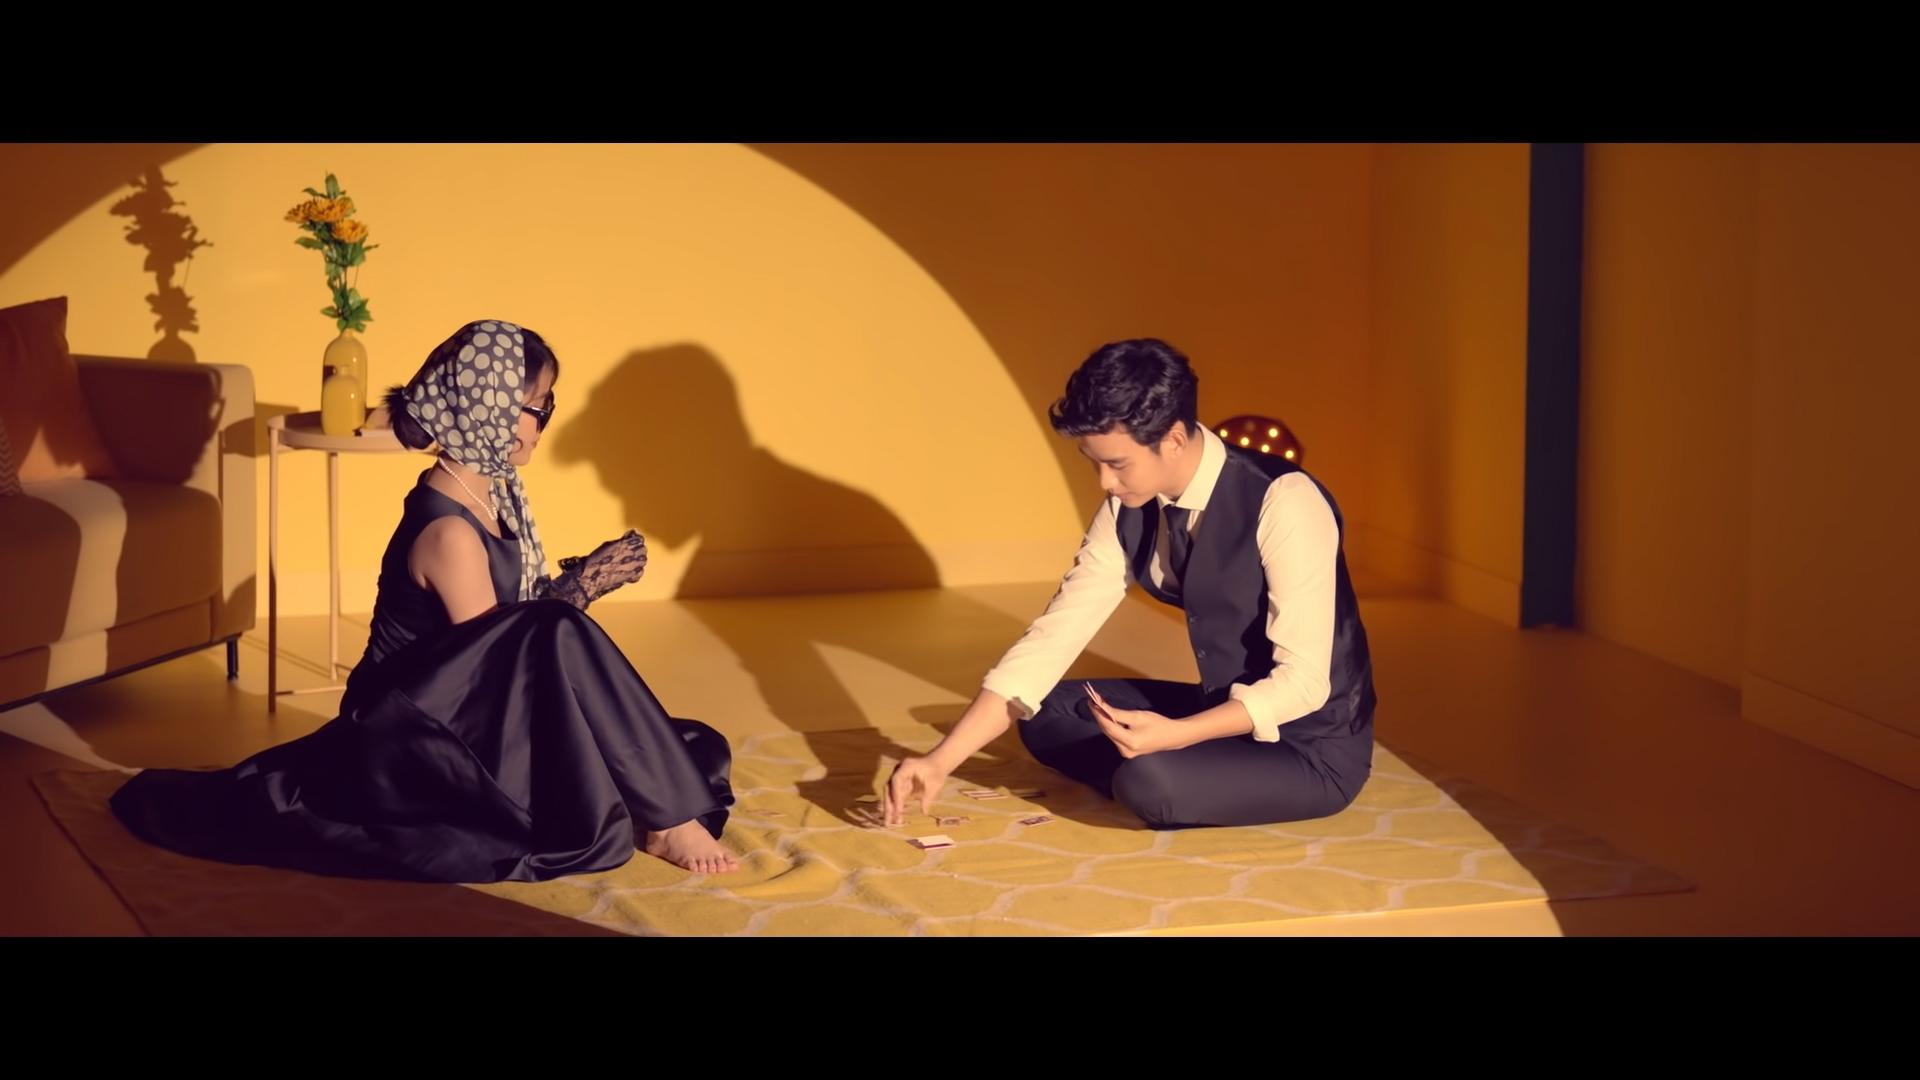 ca sĩ IU mặc đầm lụa đen trong MV ending scene